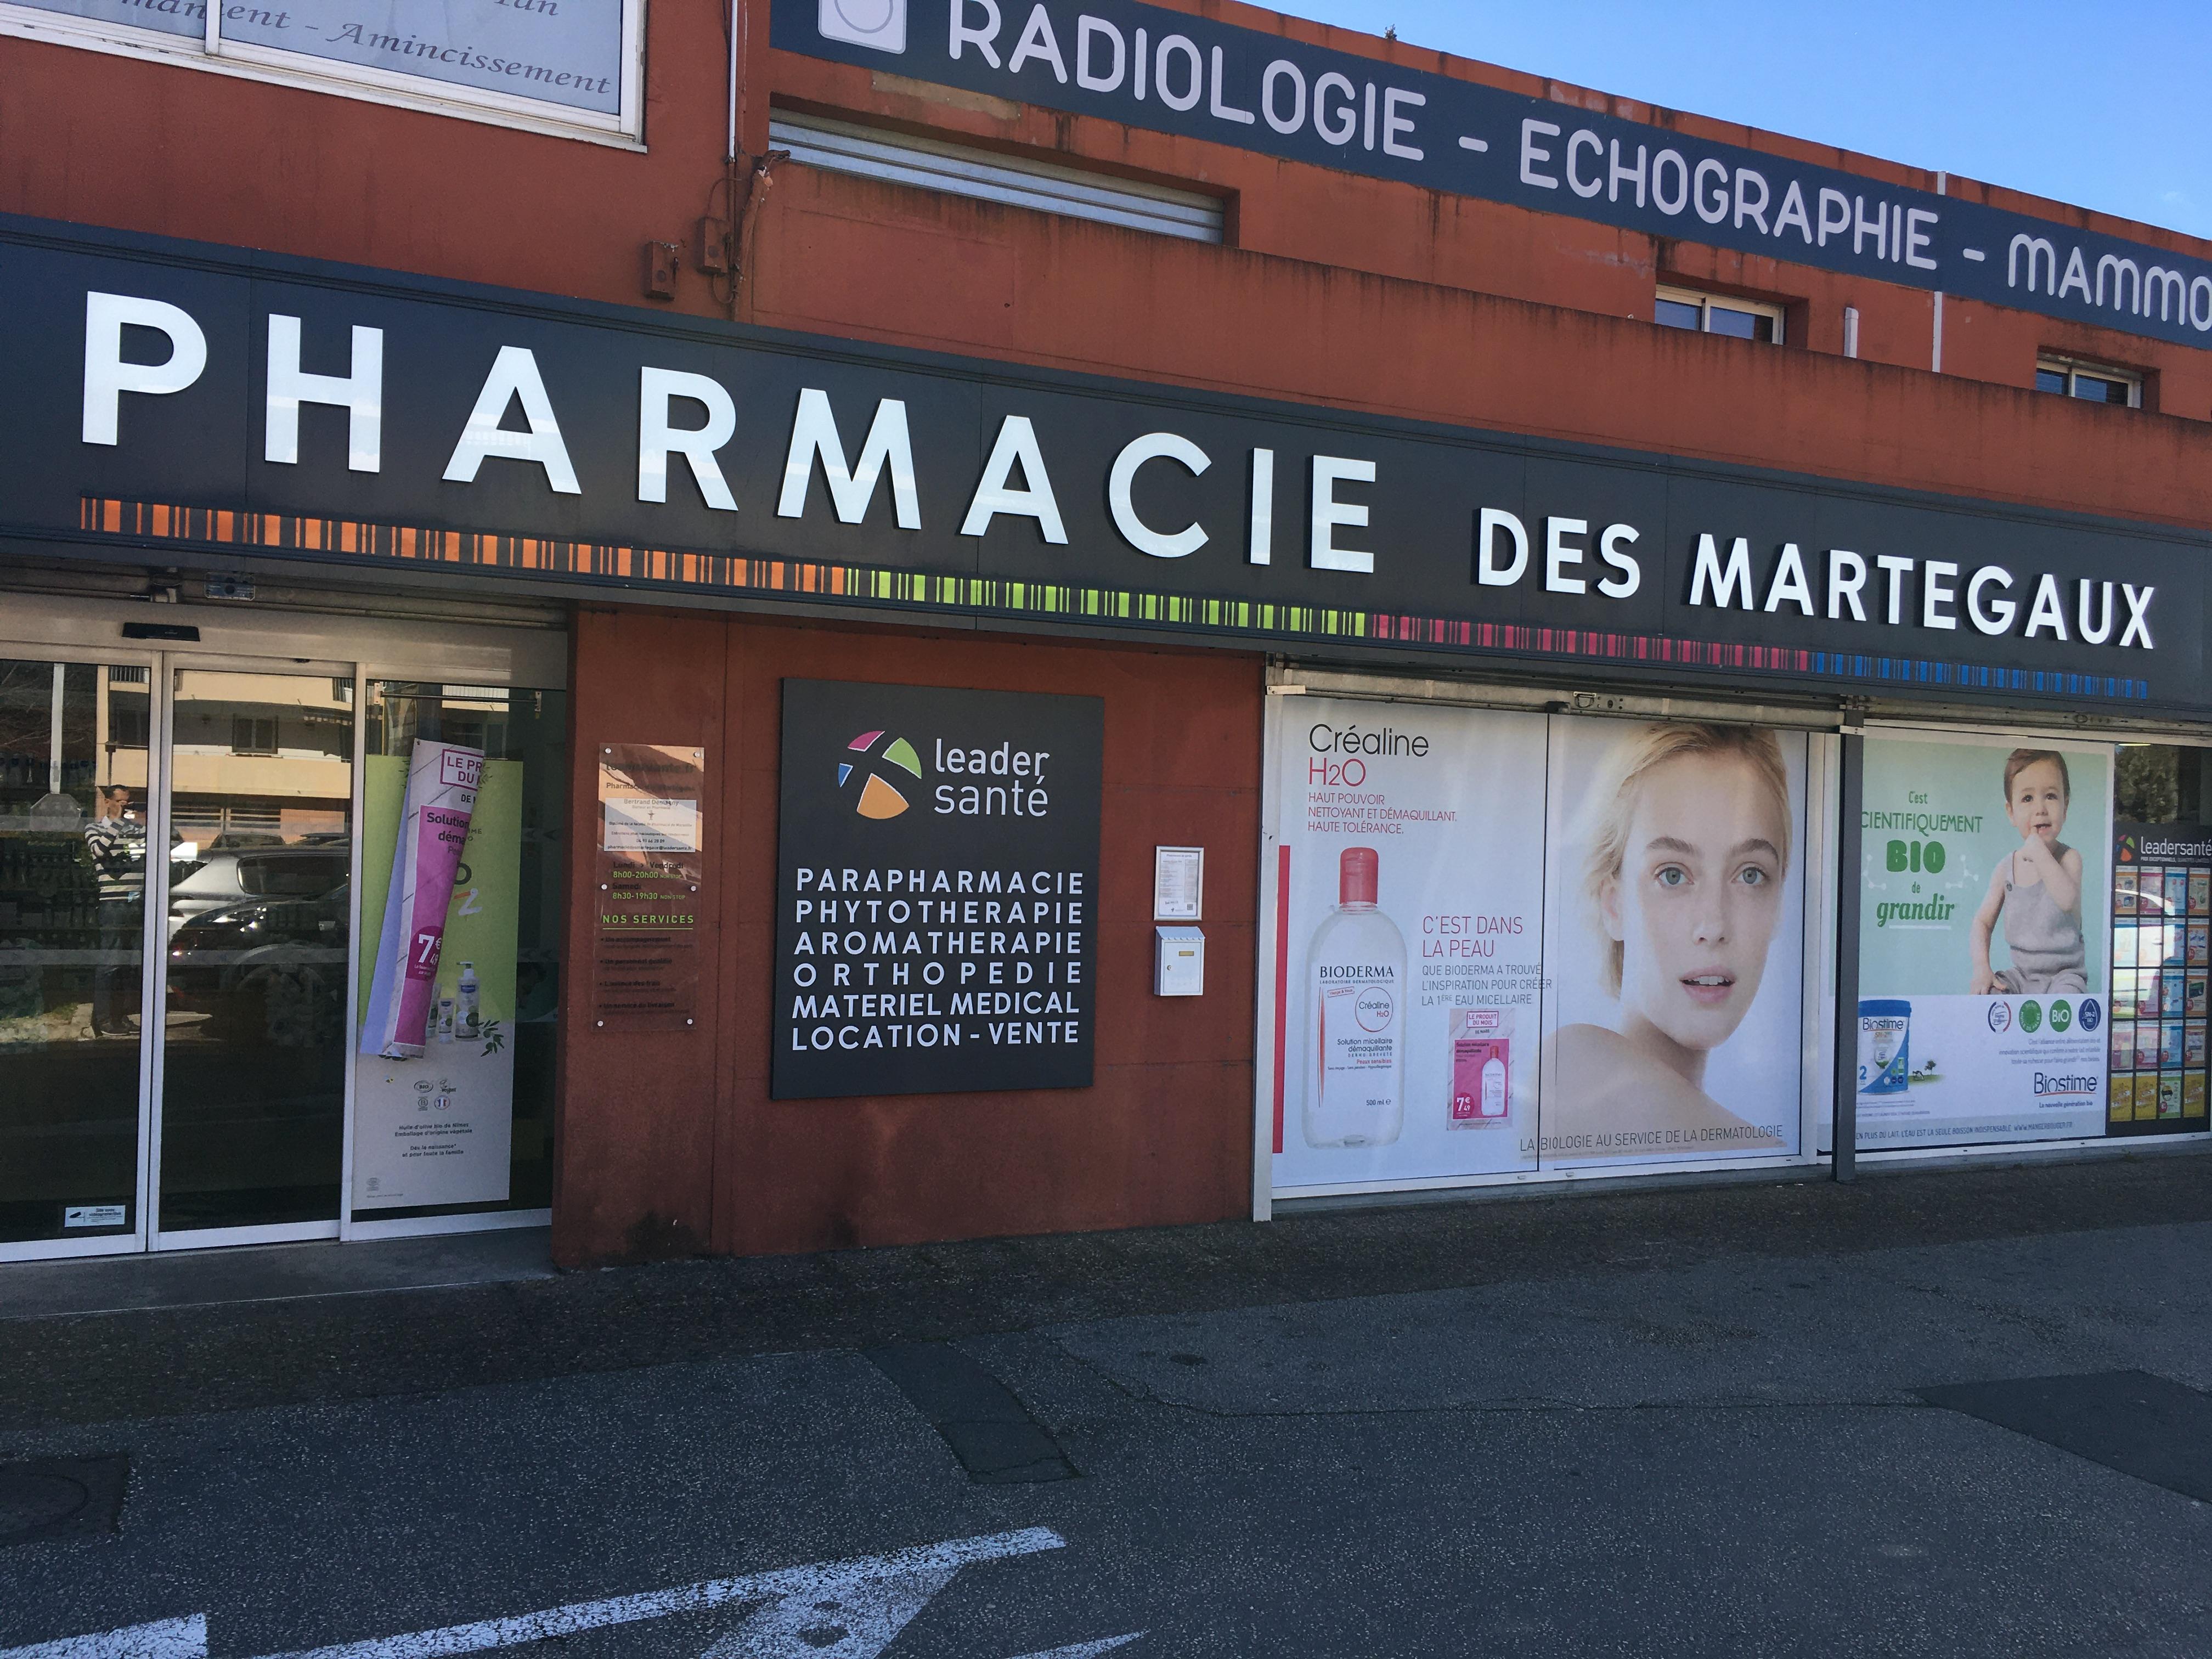 Pharmacie des martegaux